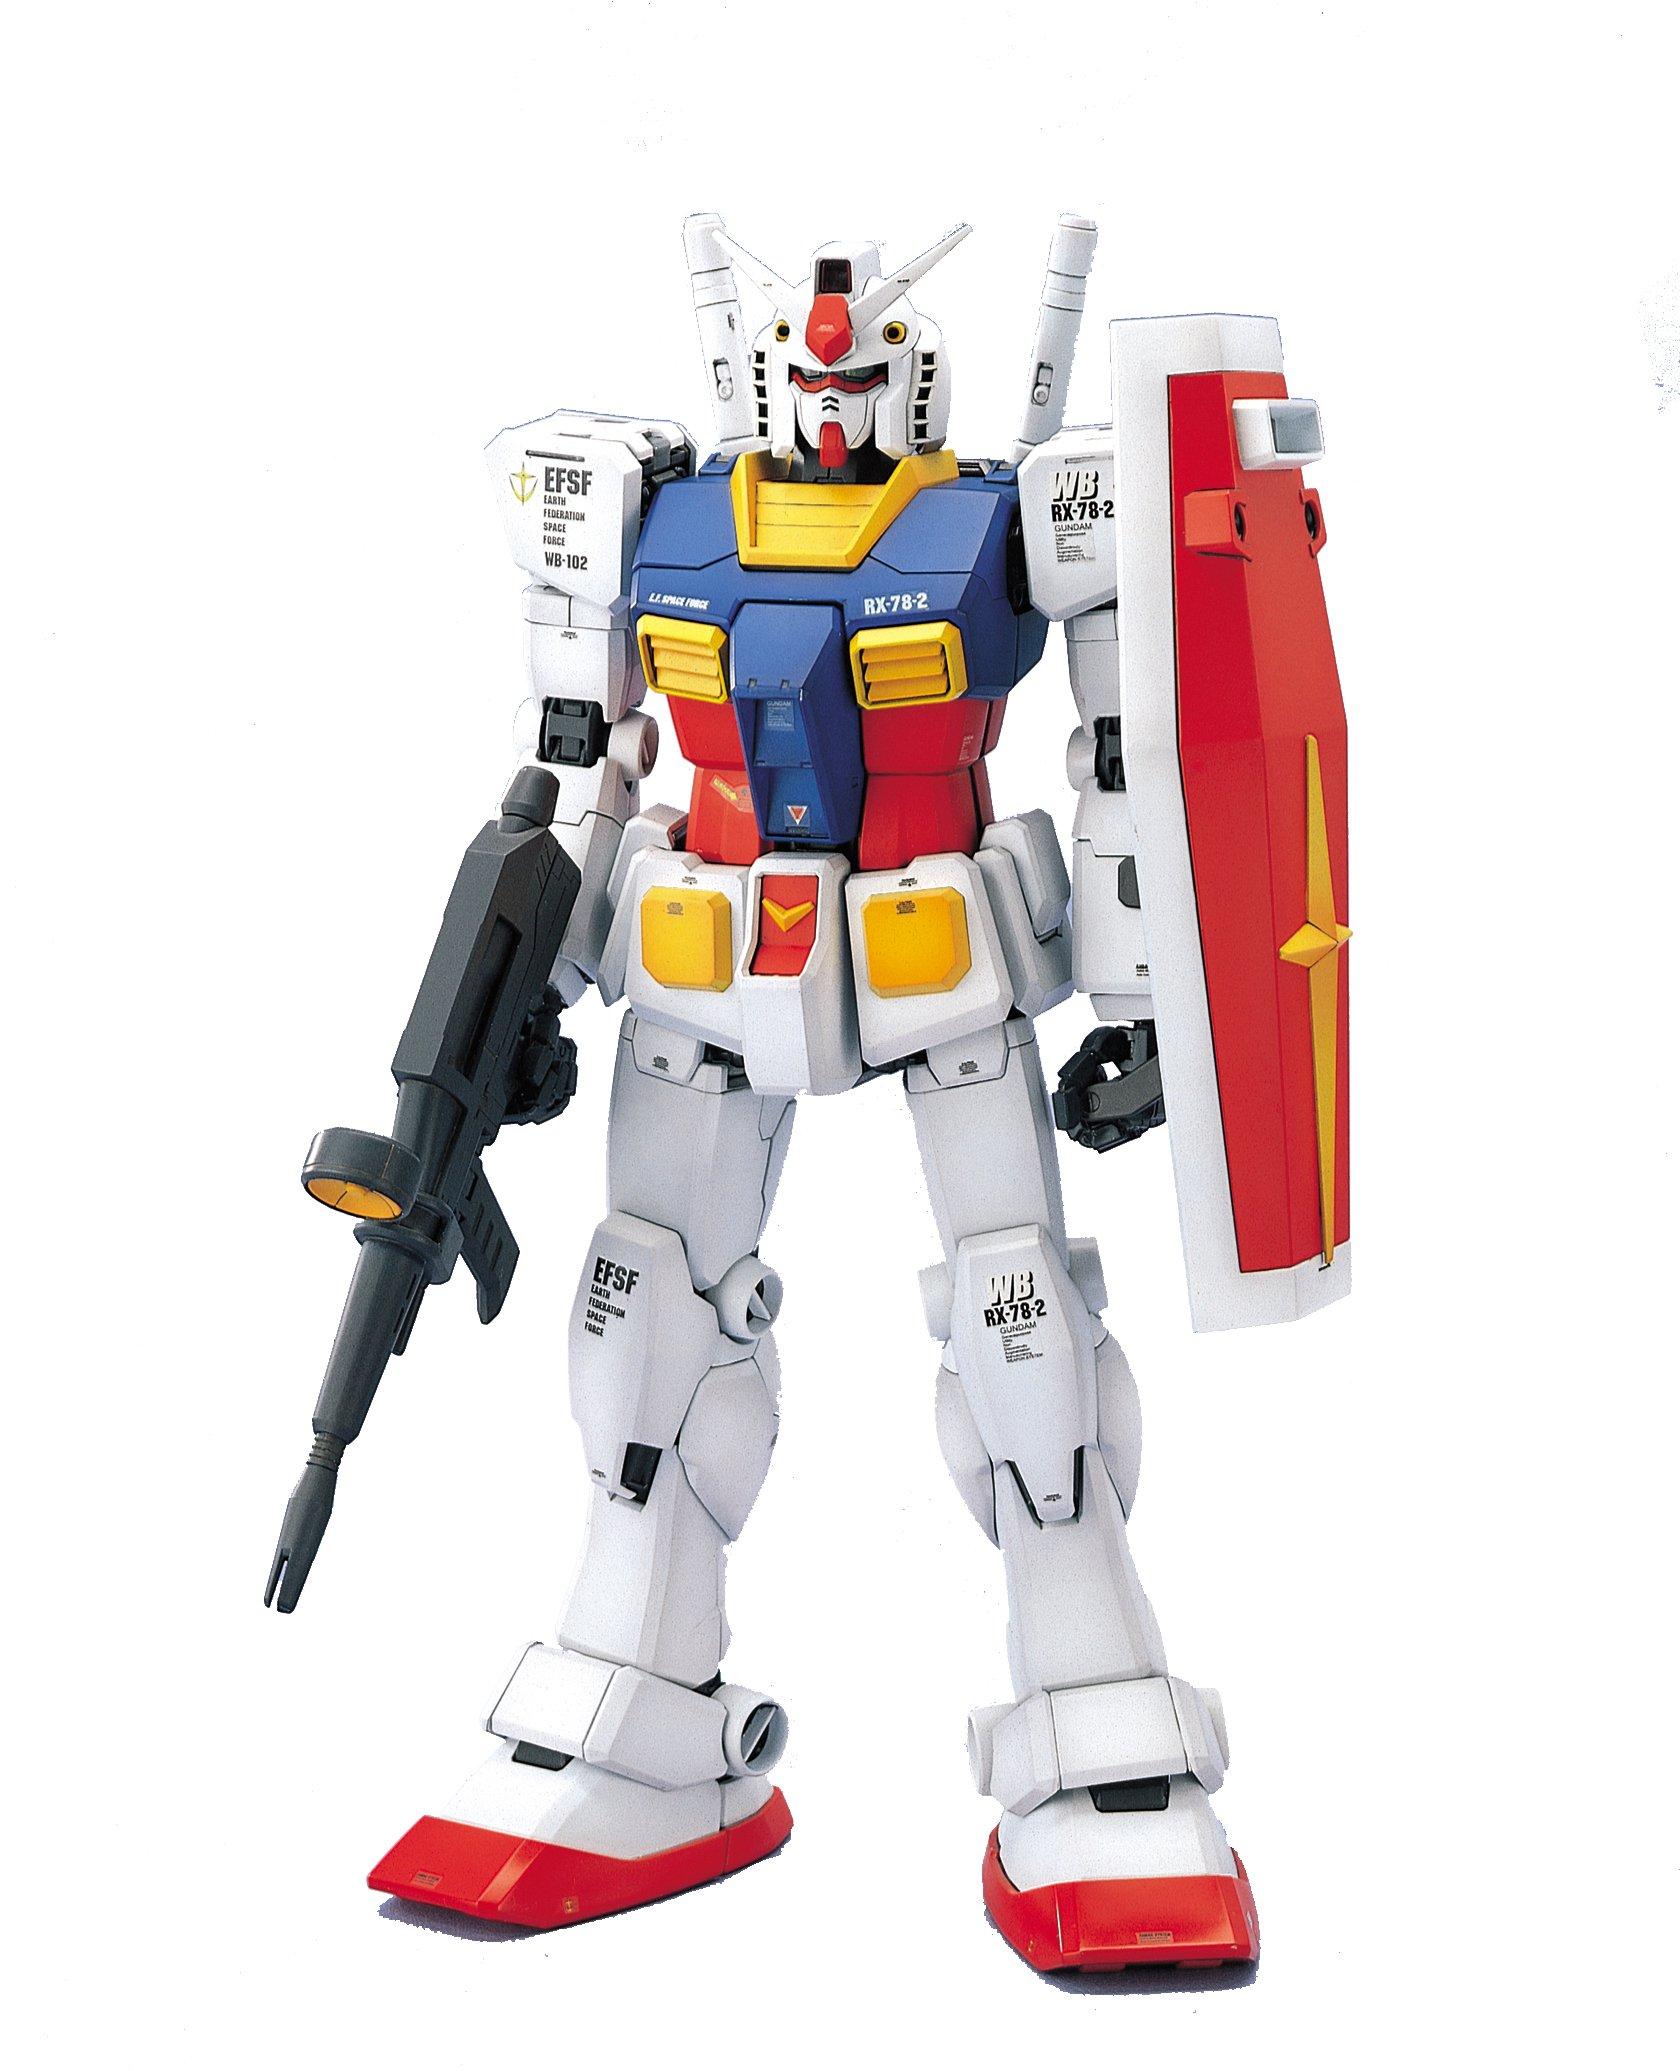 Bandai Hobby RX-78-2 Gundam Mobile Suit Gundam Perfect Grade Action Figure, Scale 1:60